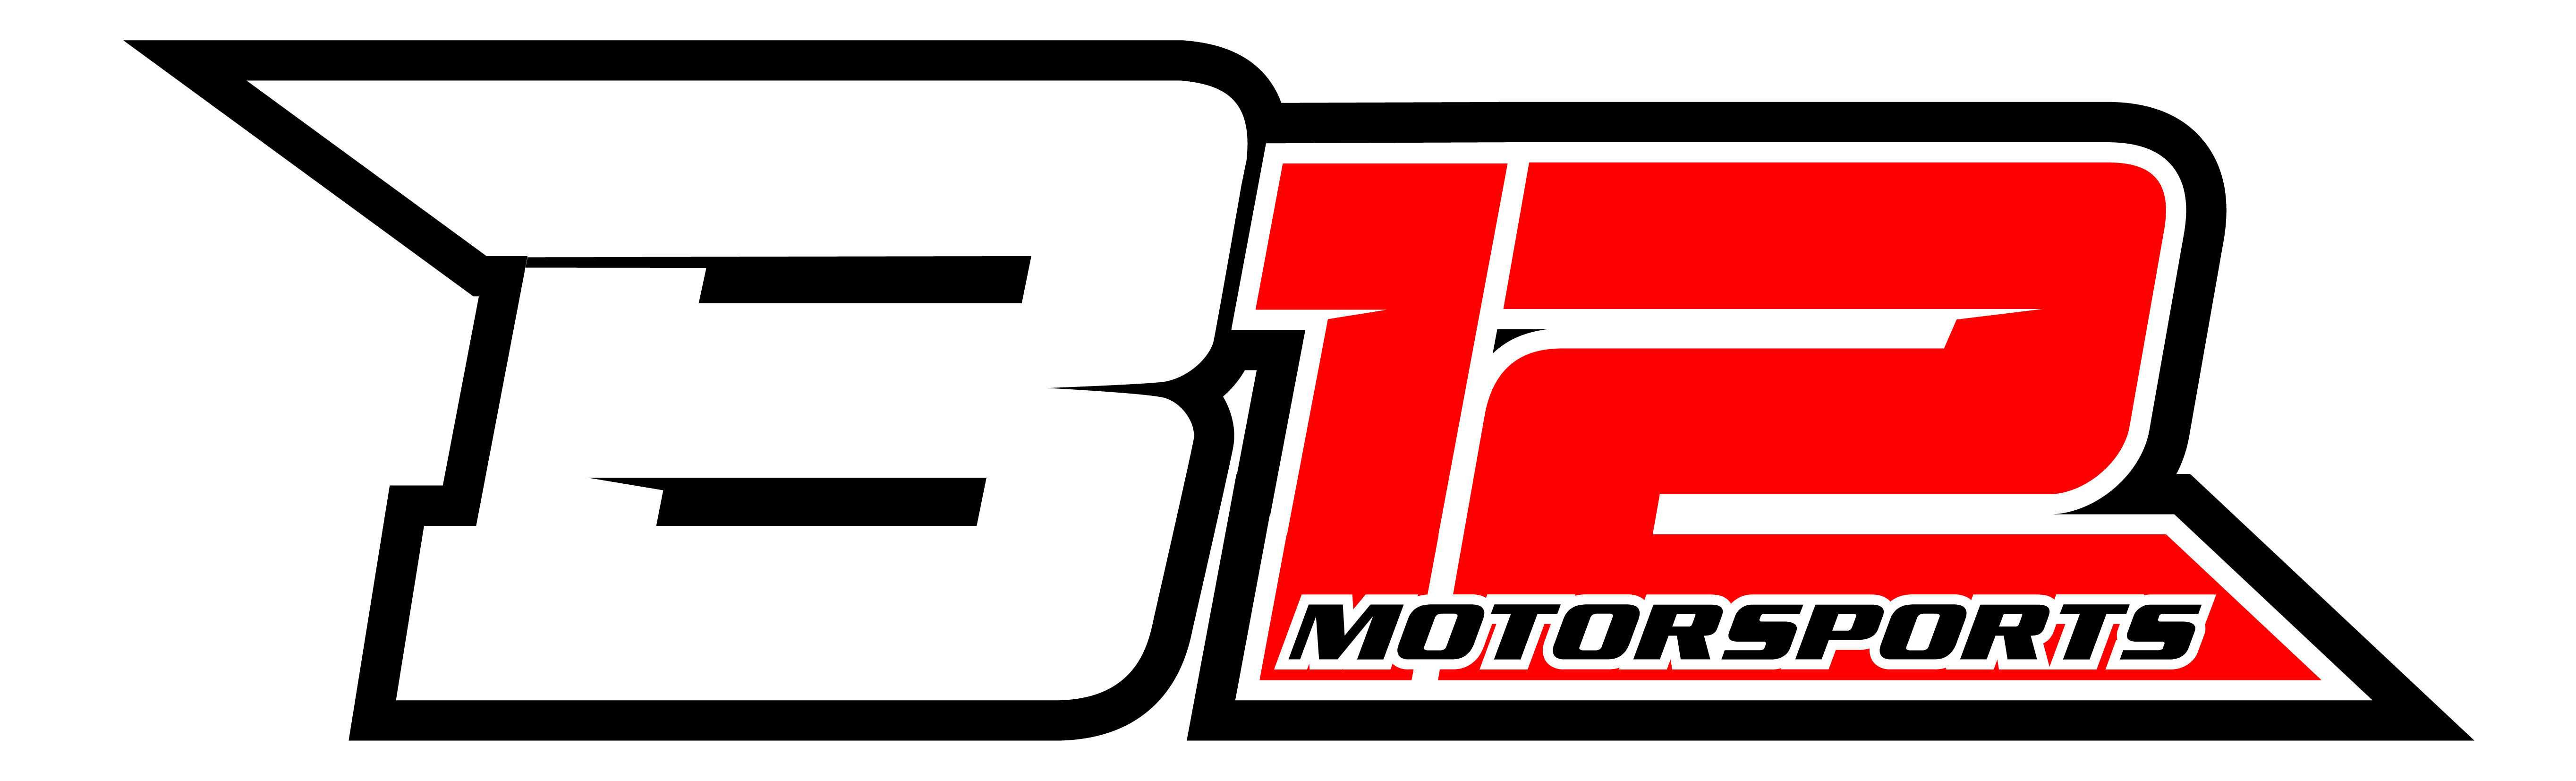 B12 Motorsports